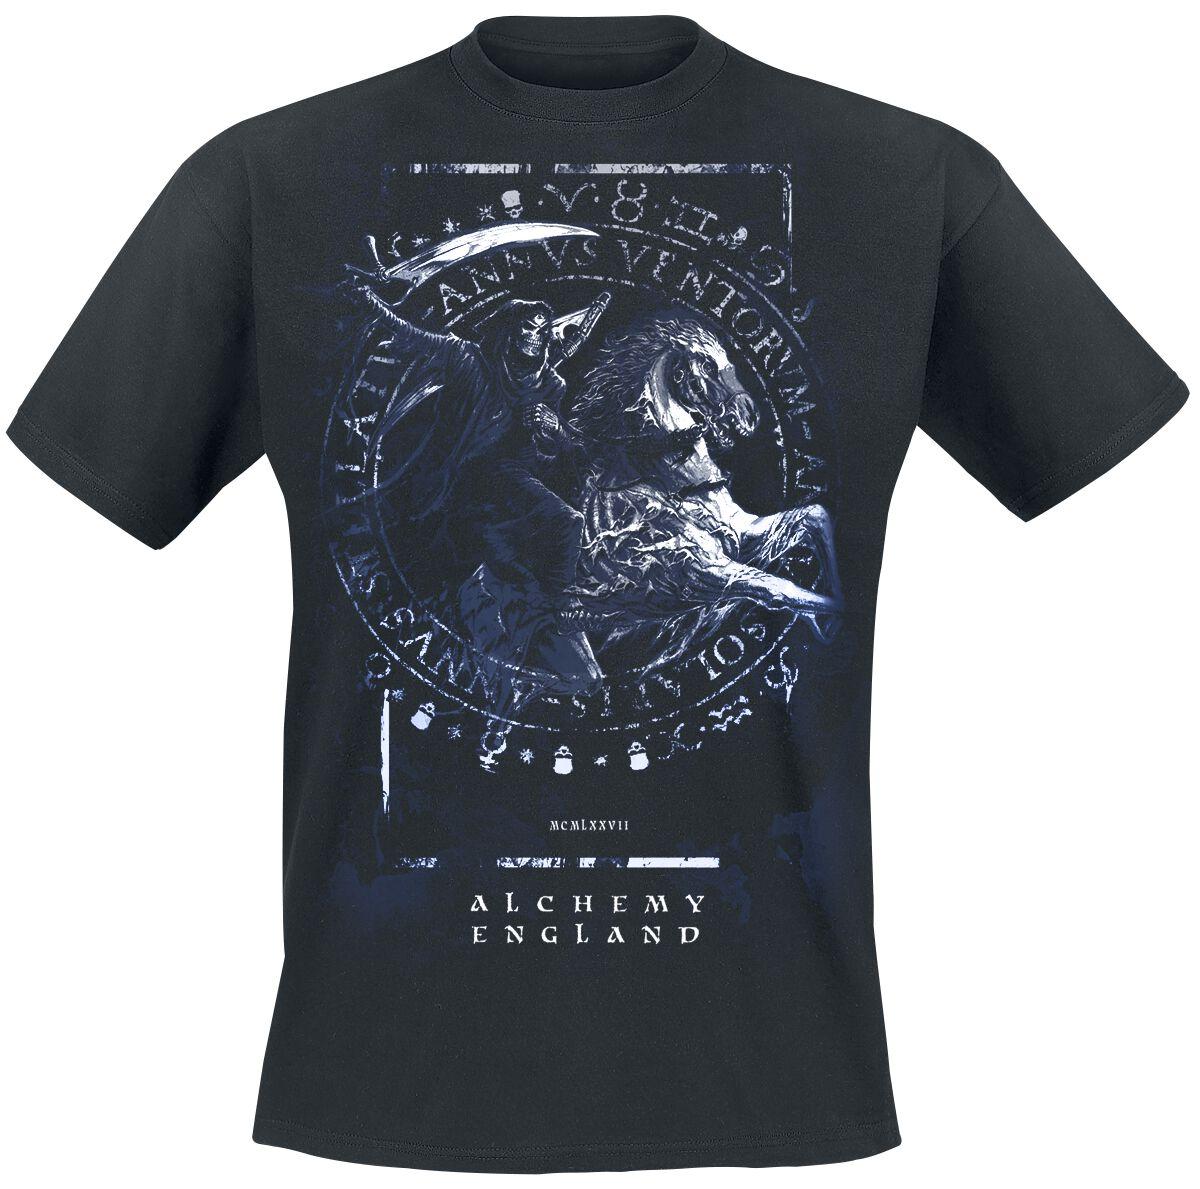 Image of   Alchemy England Classic - Apocalypse of Death T-Shirt sort